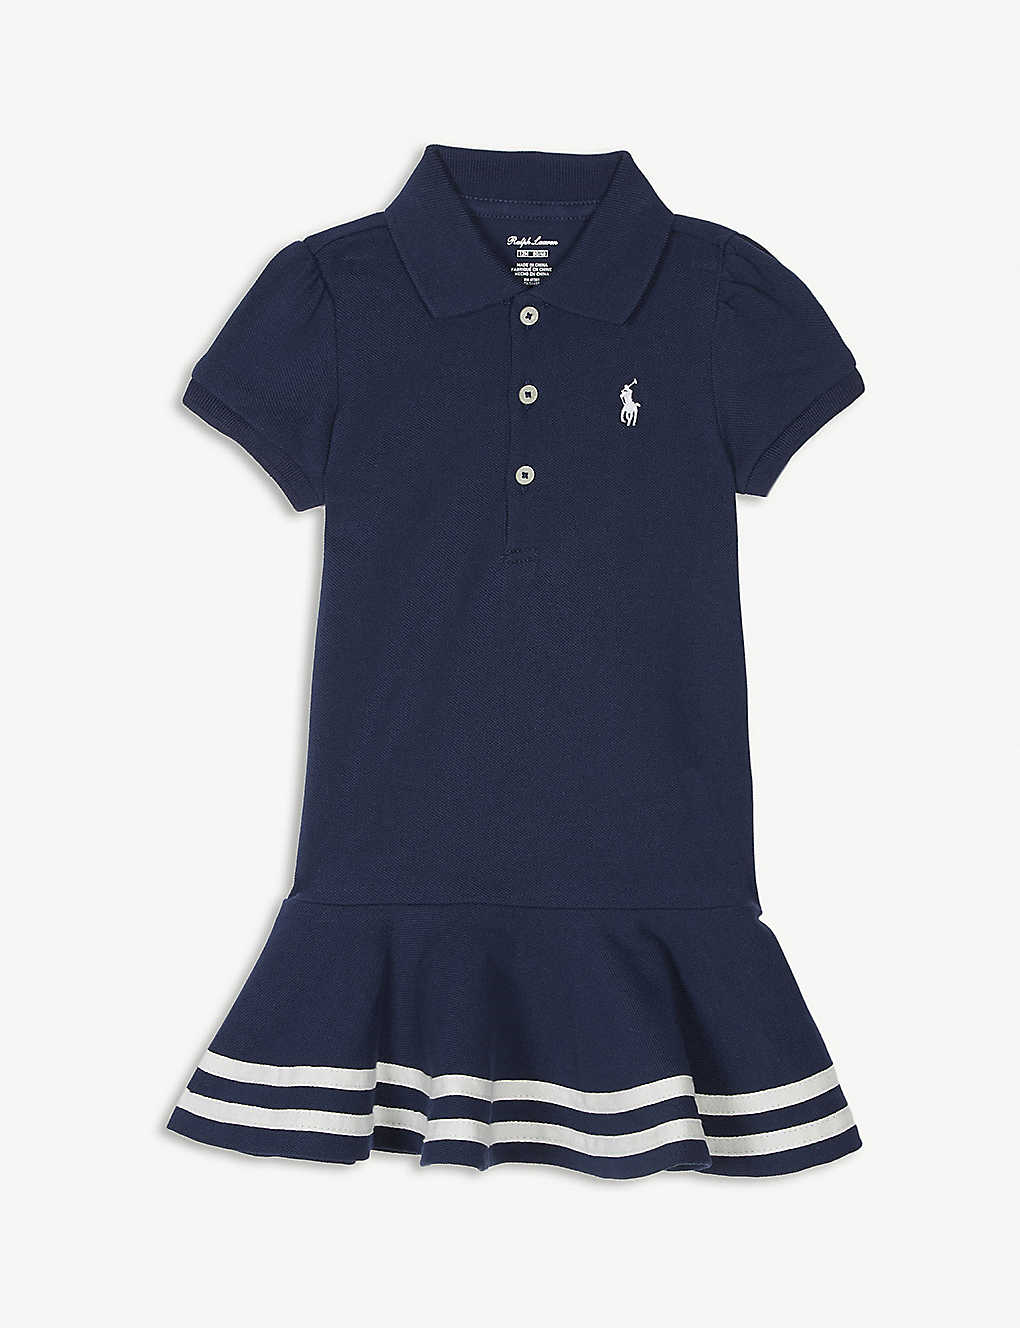 9e25b467c4 RALPH LAUREN - Striped cotton polo dress 3-24 months   Selfridges.com